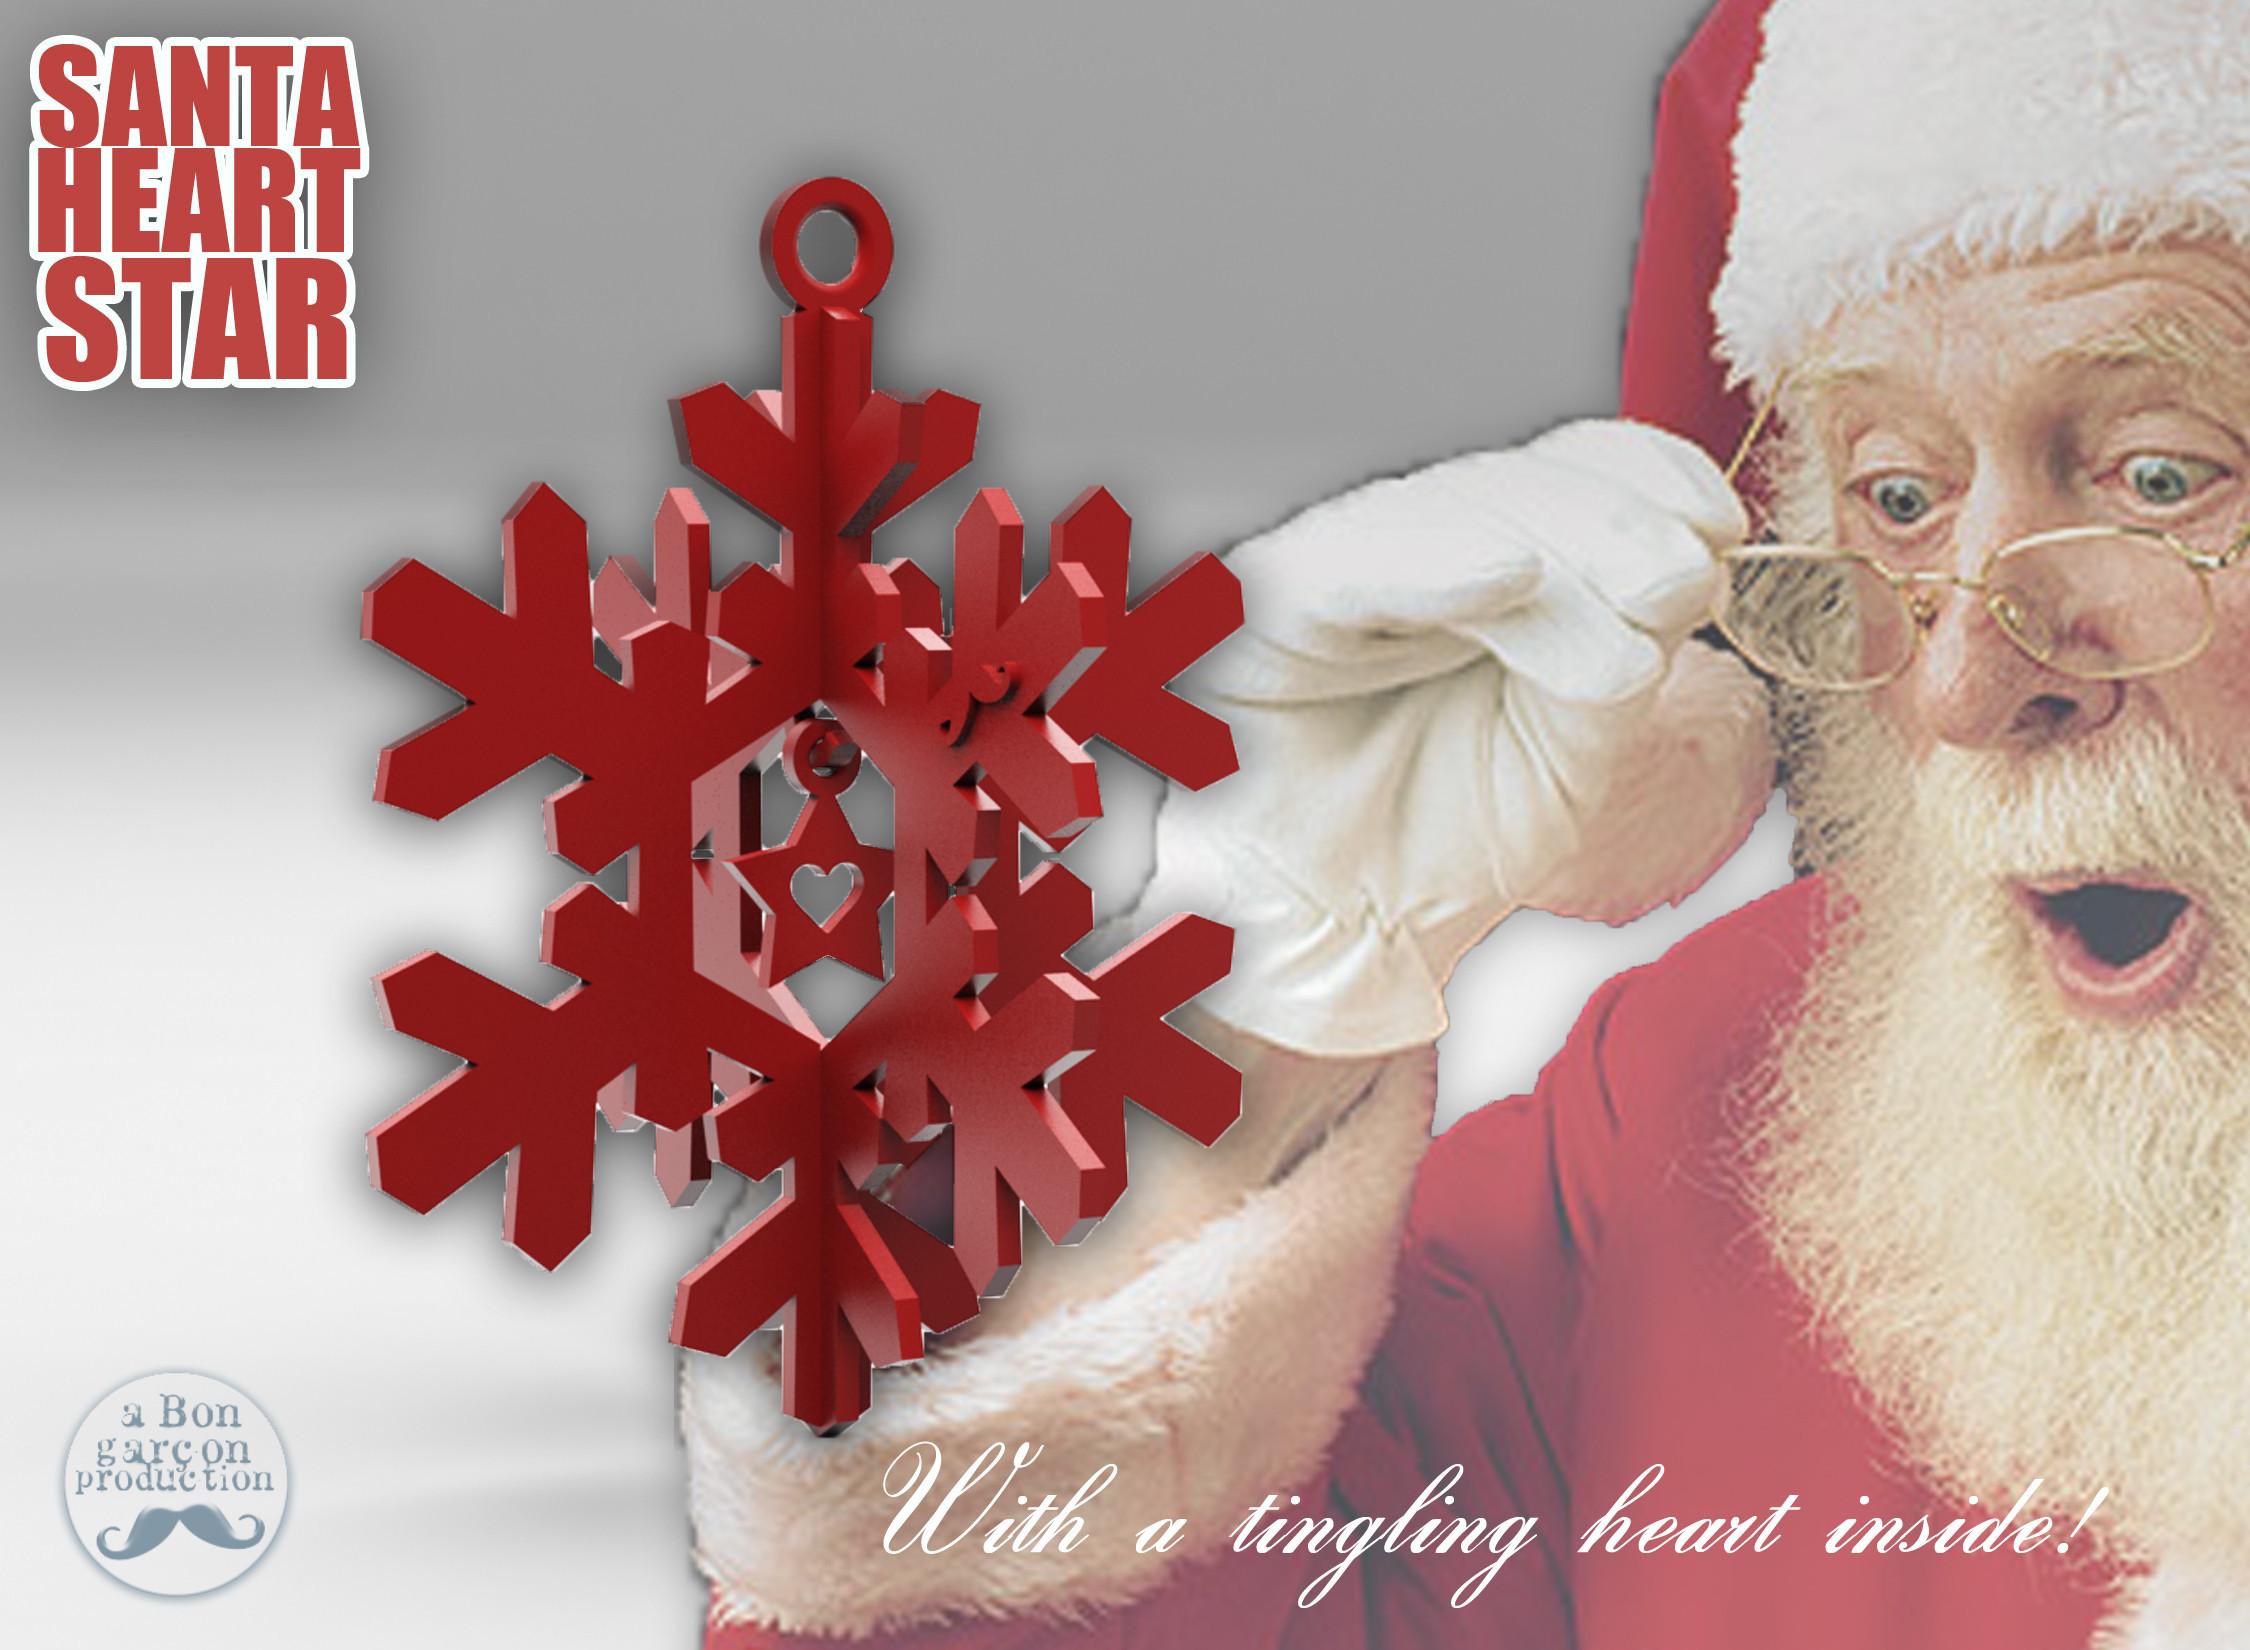 SantaStar-01.jpg Download free STL file SANTA STAR -with a Tingling Heart inside- • 3D printer object, BonGarcon